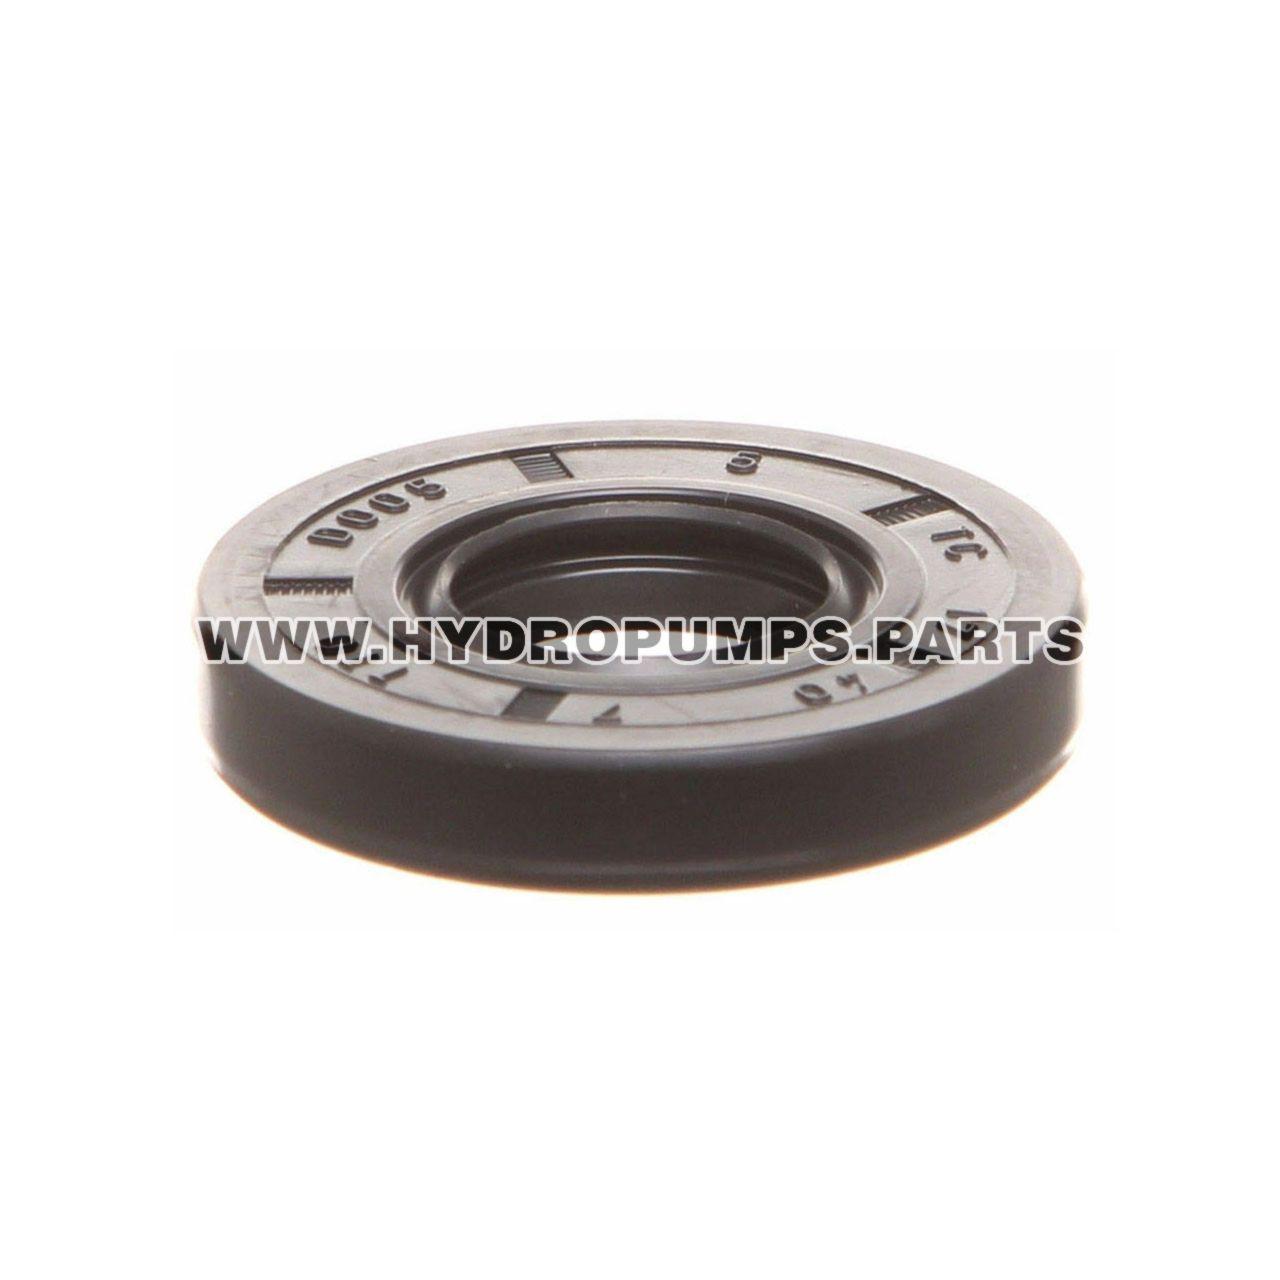 Hydro Gear 51161 - Seal 17 X 40 X 7 Lip - Image 1